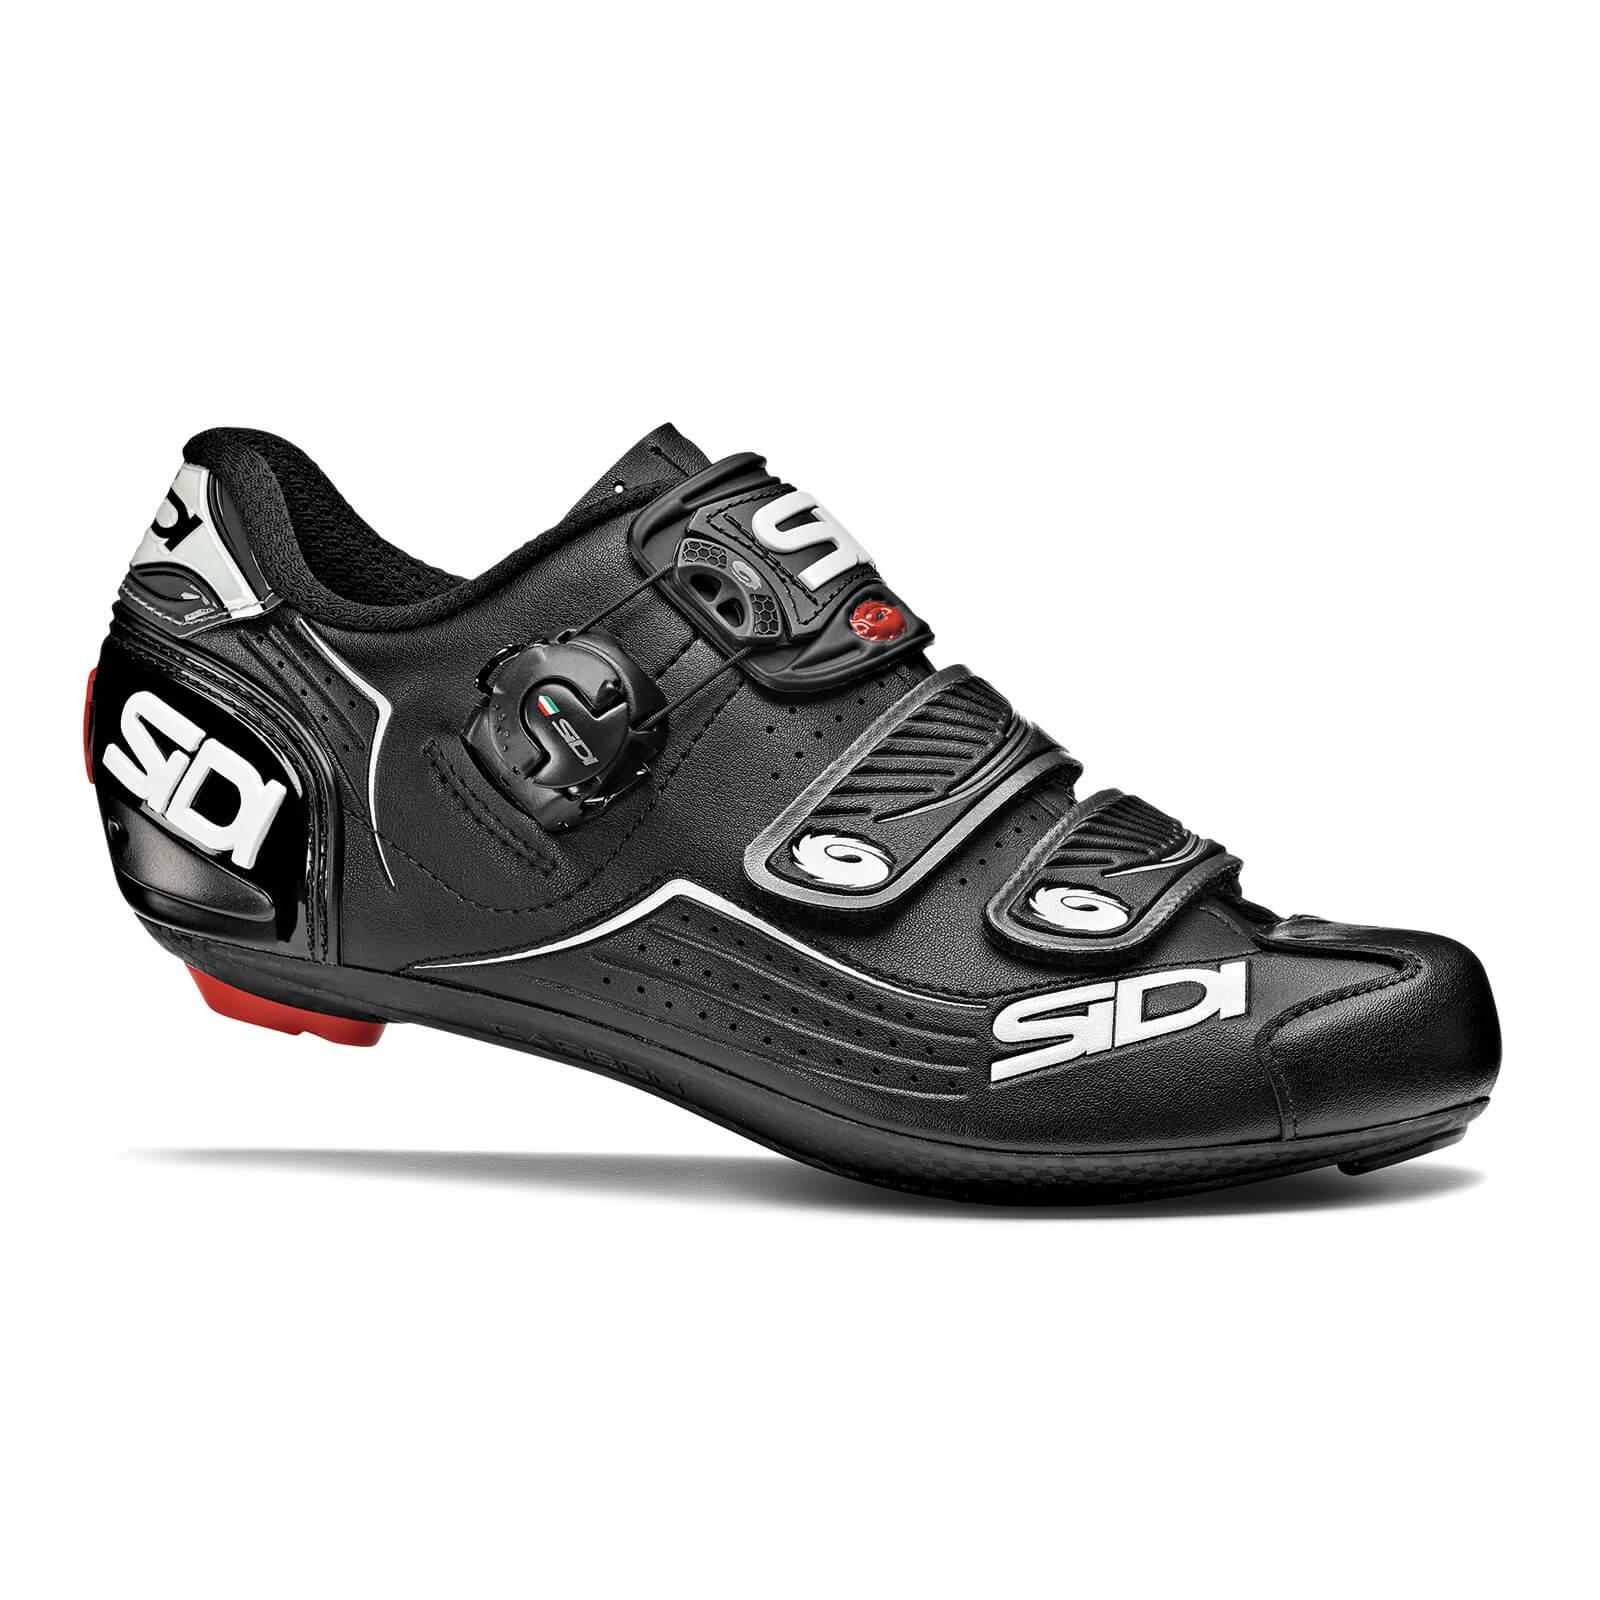 Sidi Women's Alba Road Shoes - EU 40